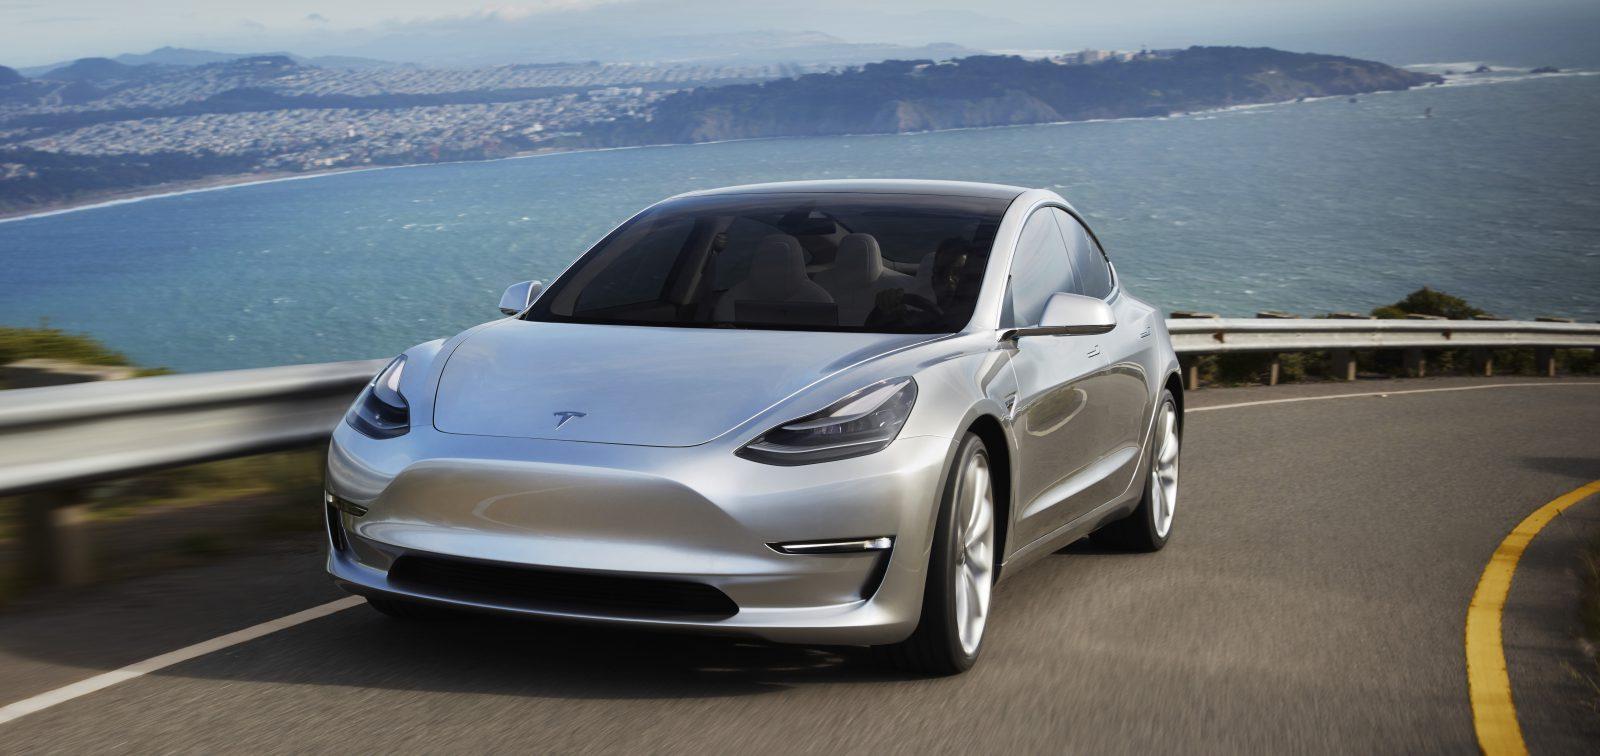 Tesla веќе продава подобро од Jaguar, а и Porsche не е далеку